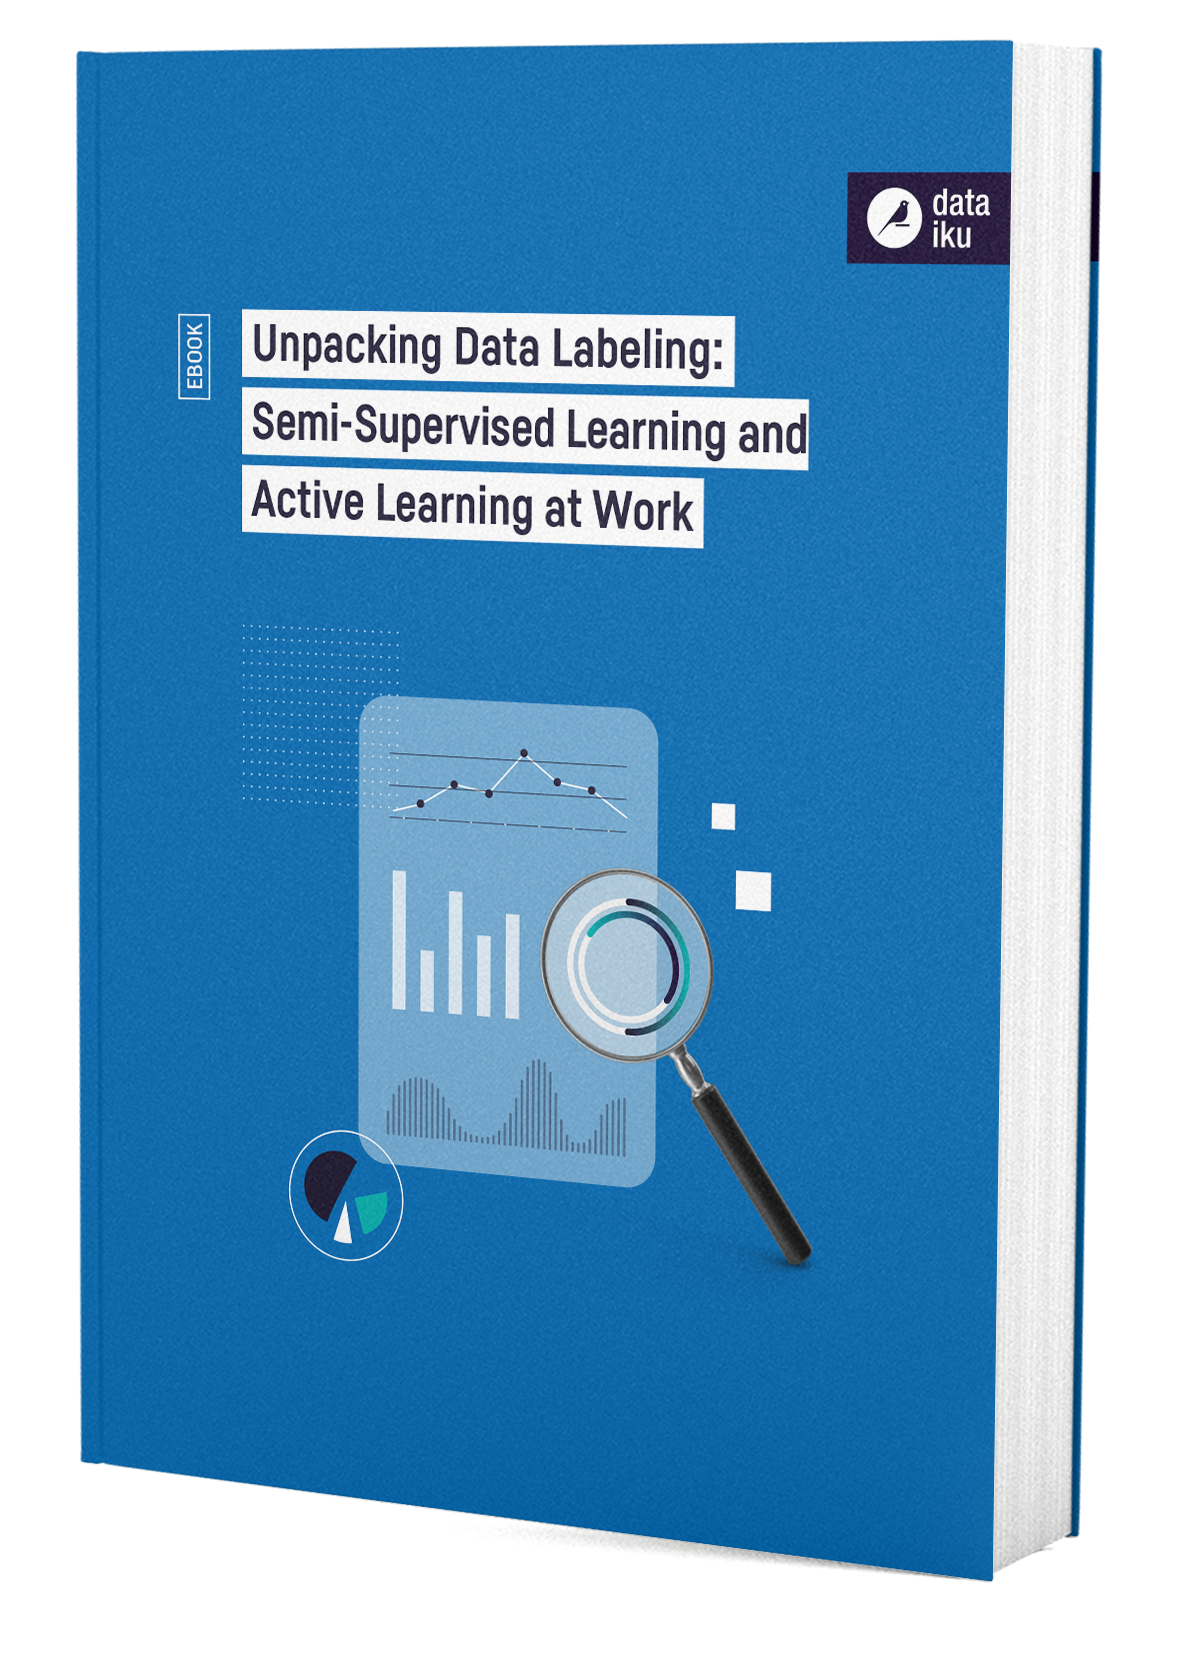 DTKU_Unpacking-Data-Labelling_Ebook_WEB.pdf